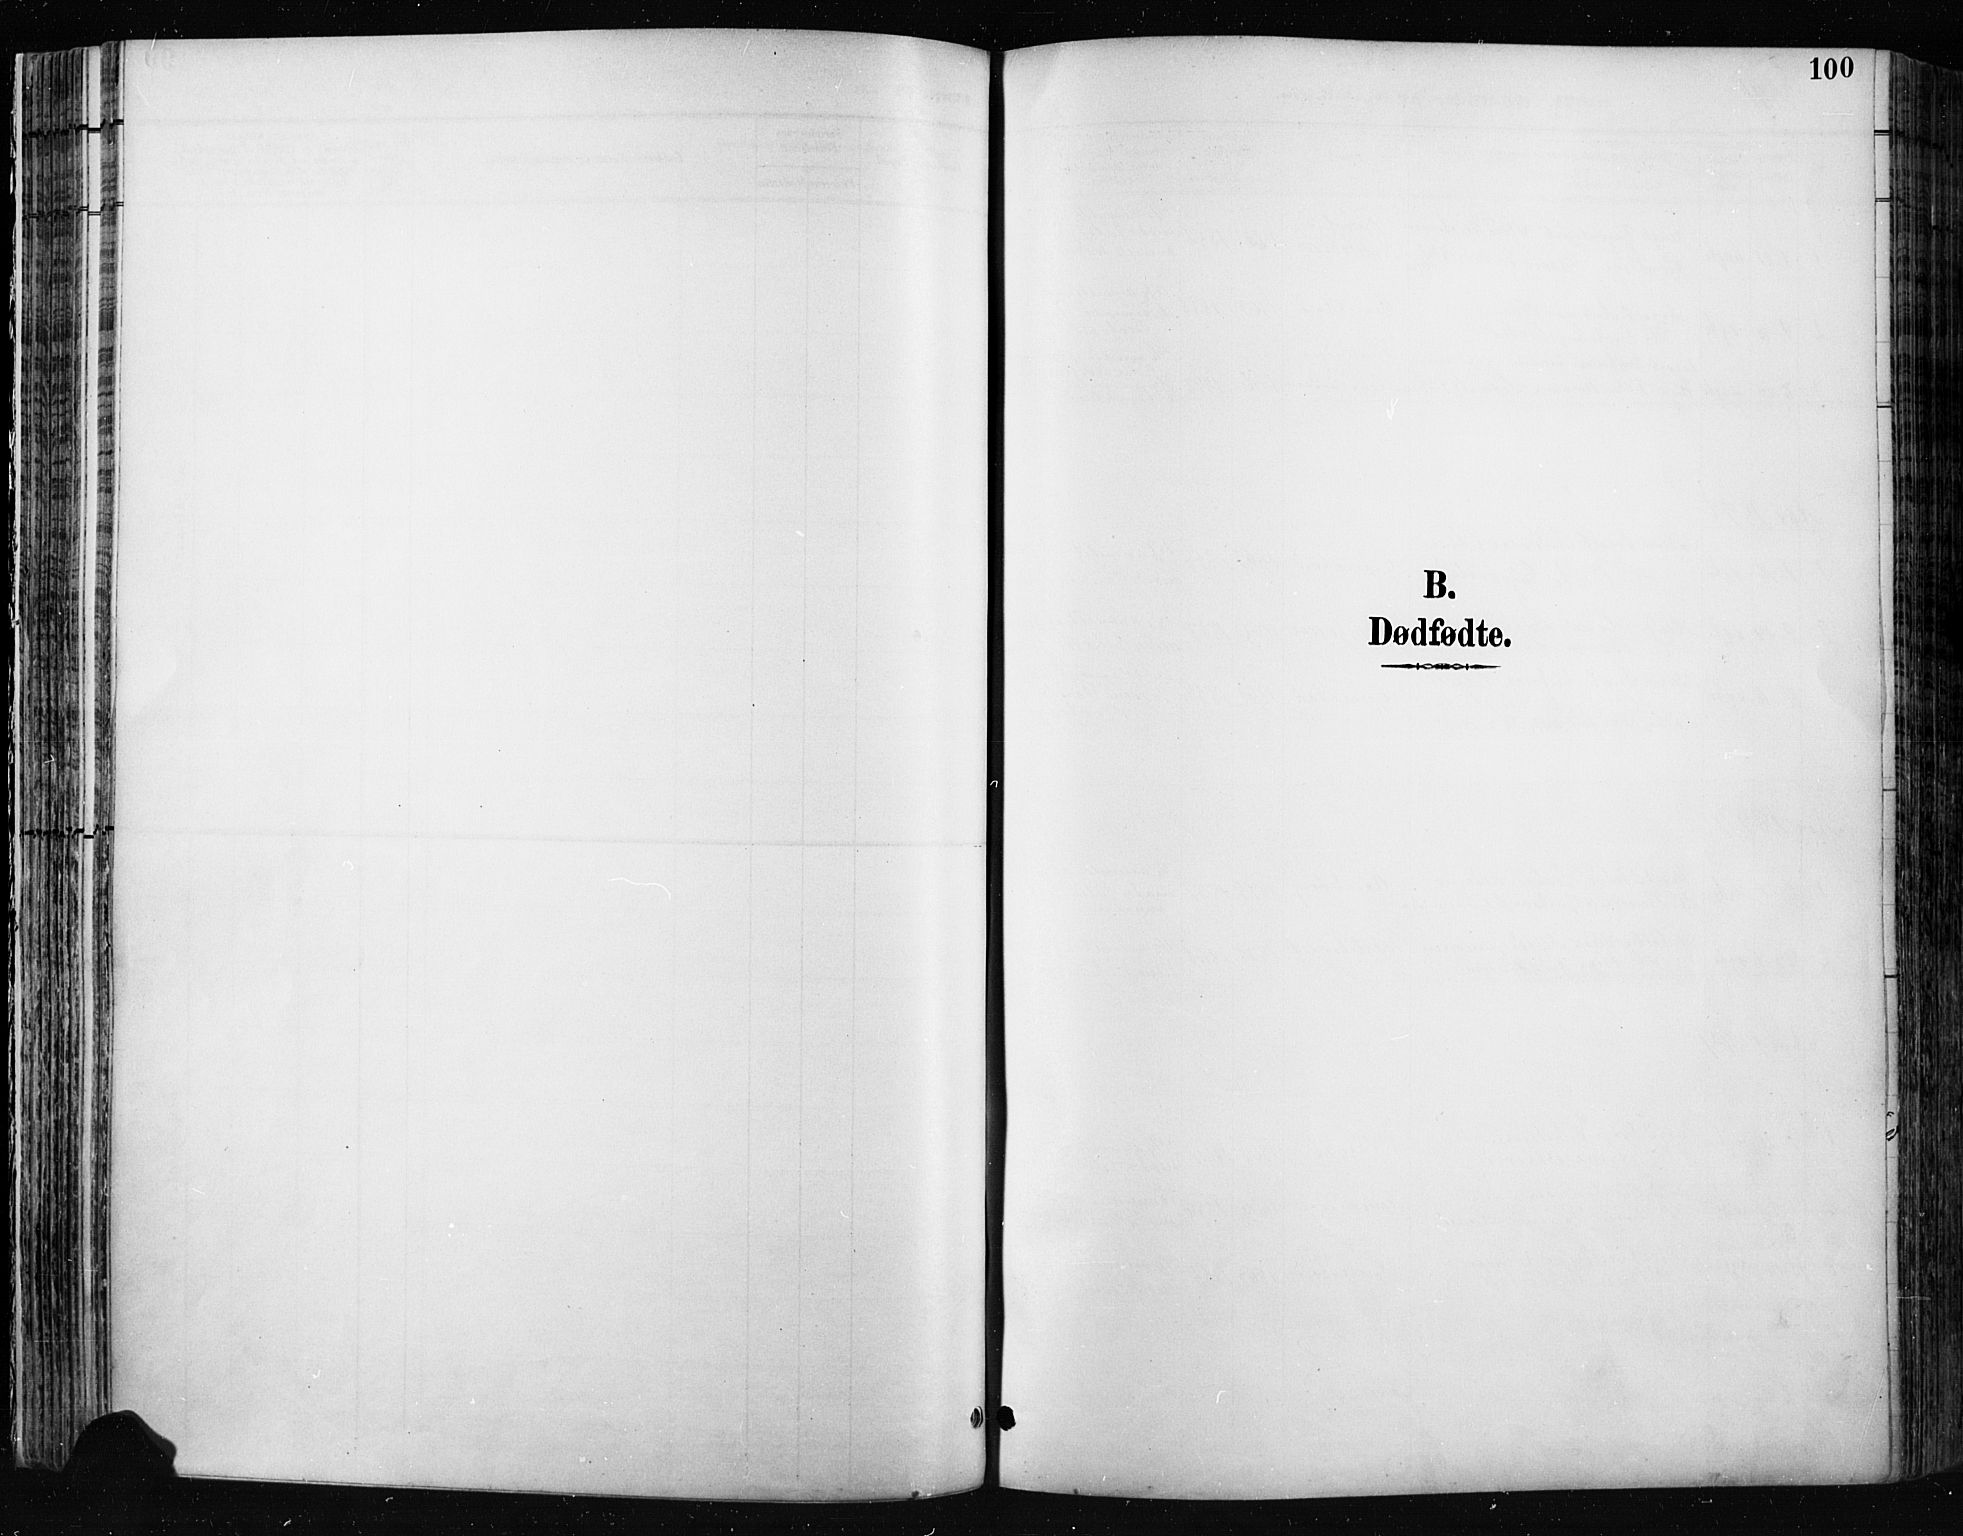 SAH, Jevnaker prestekontor, Ministerialbok nr. 9, 1891-1901, s. 100